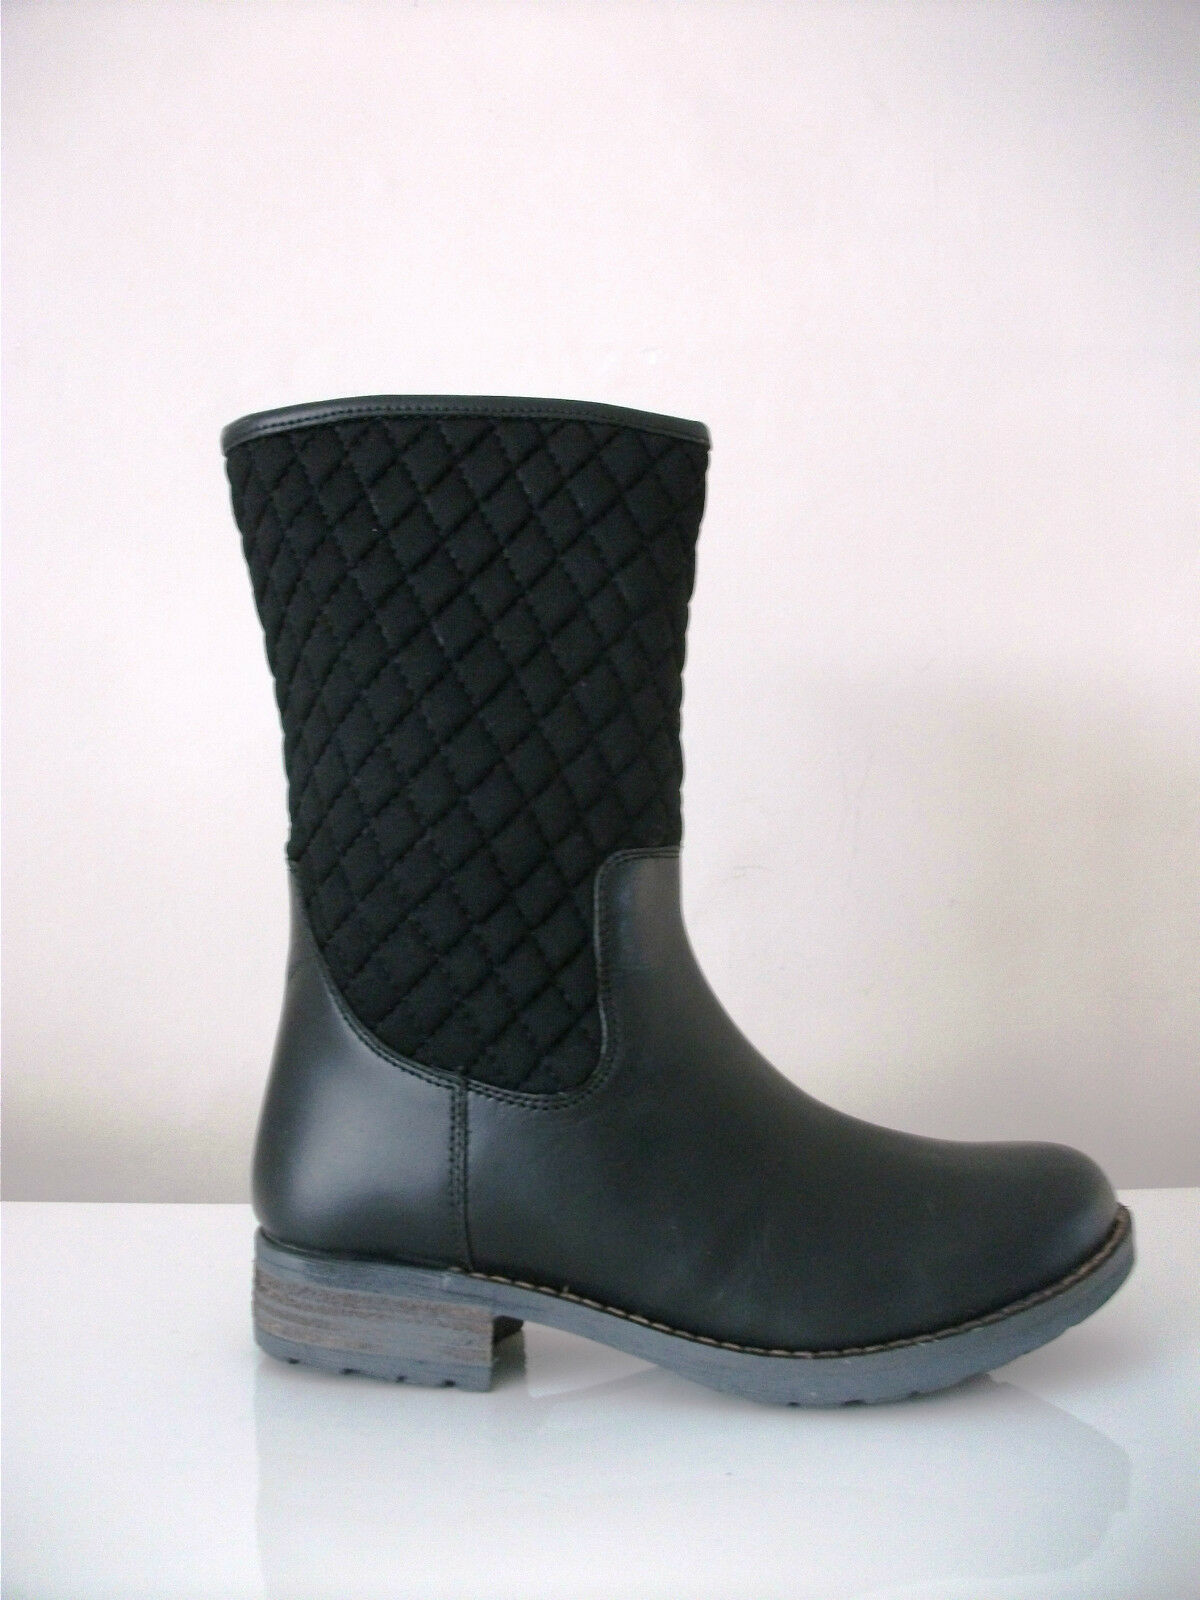 Draper Of Glastonbury Sheepskin Sheepskin Sheepskin Lined Leather Quilted Upper Boots 695bbb